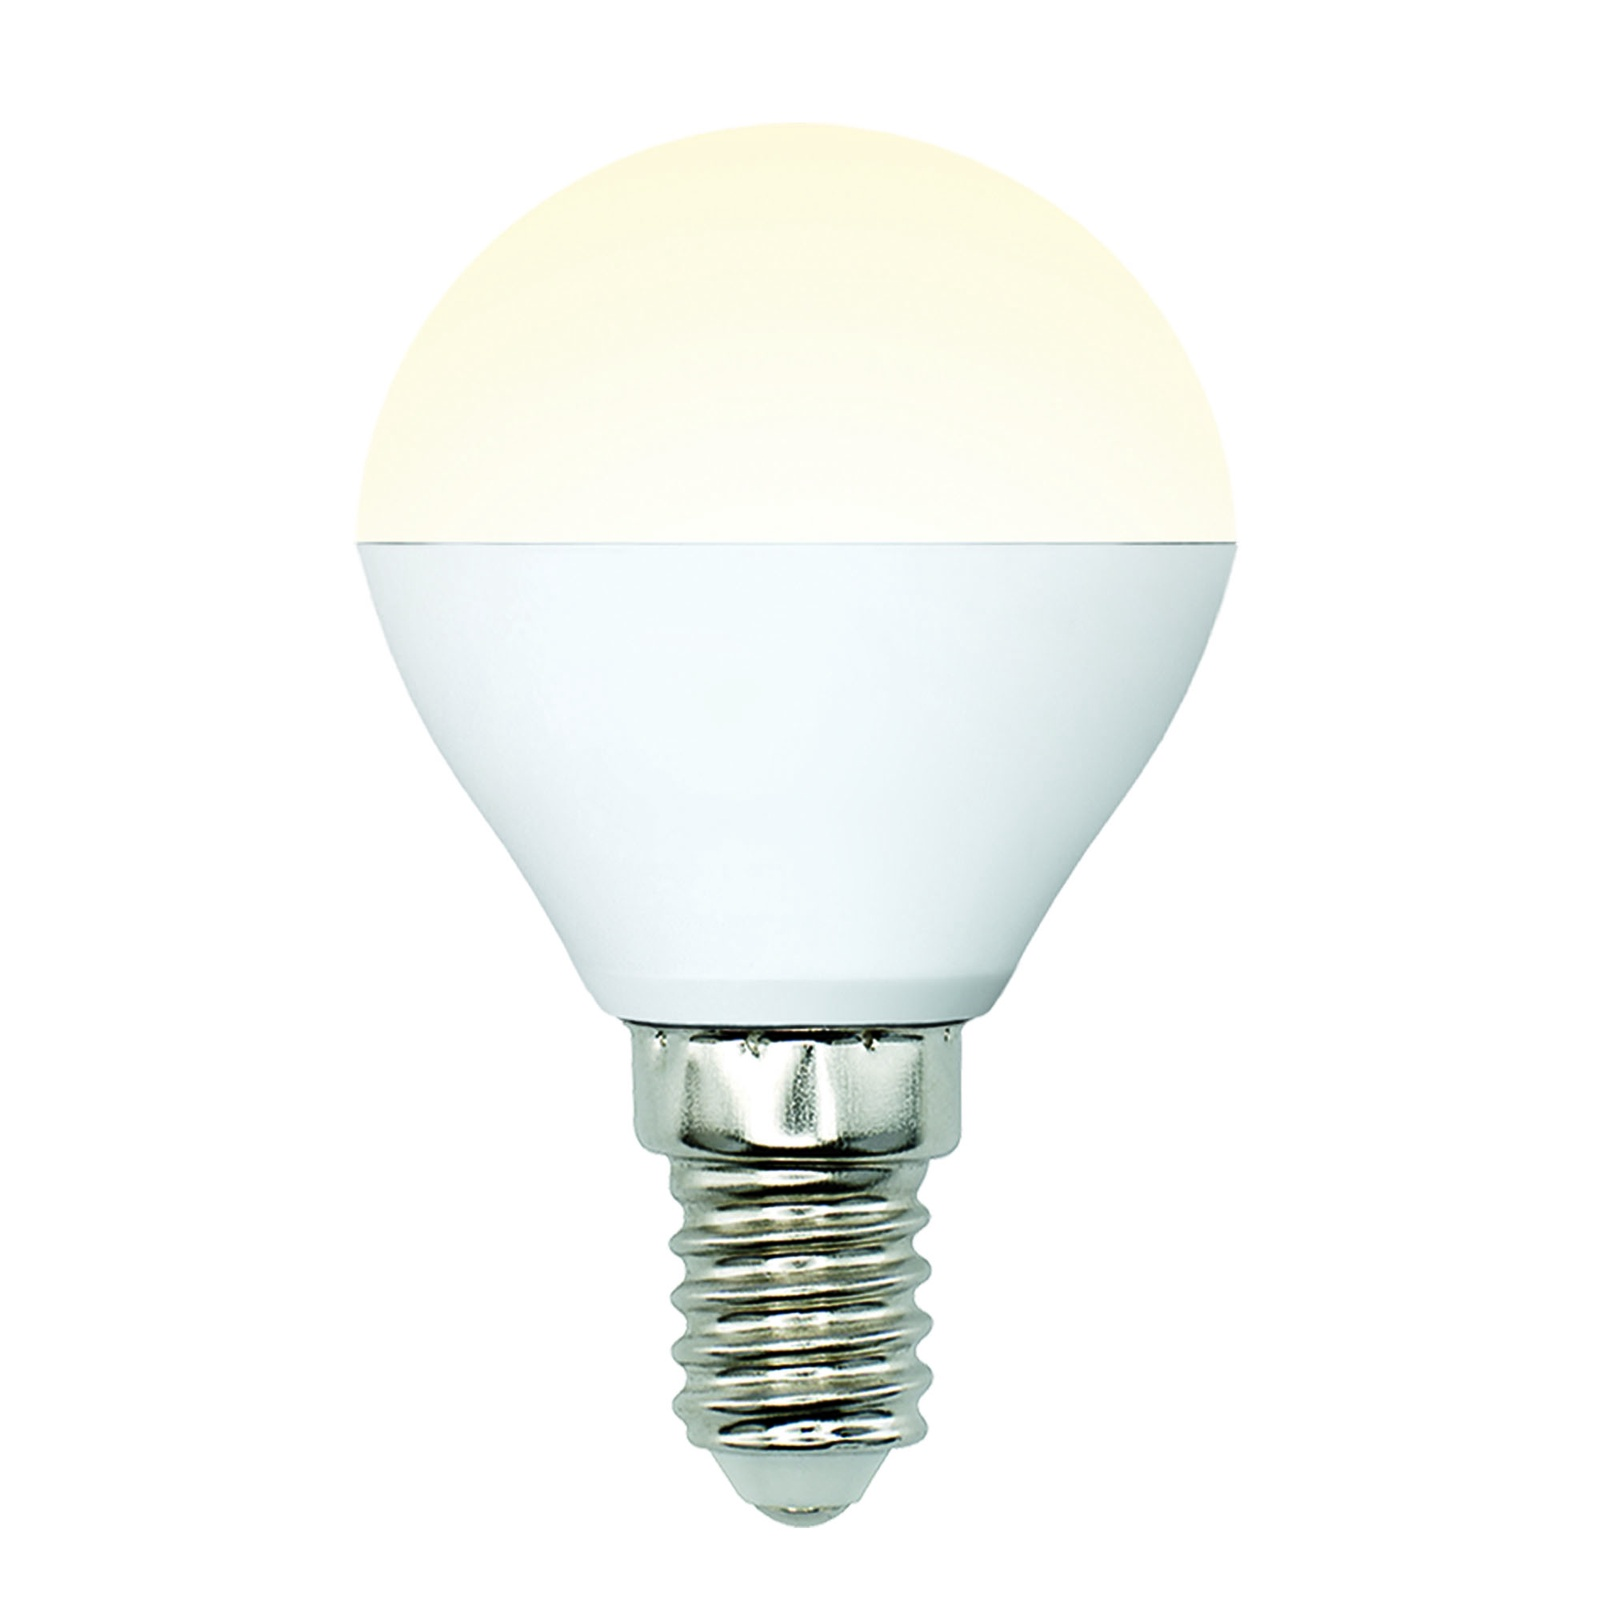 Лампочка Uniel LED-G45-6W/WW/E14/FR/MB 3000K, Теплый свет 6 Вт, Светодиодная